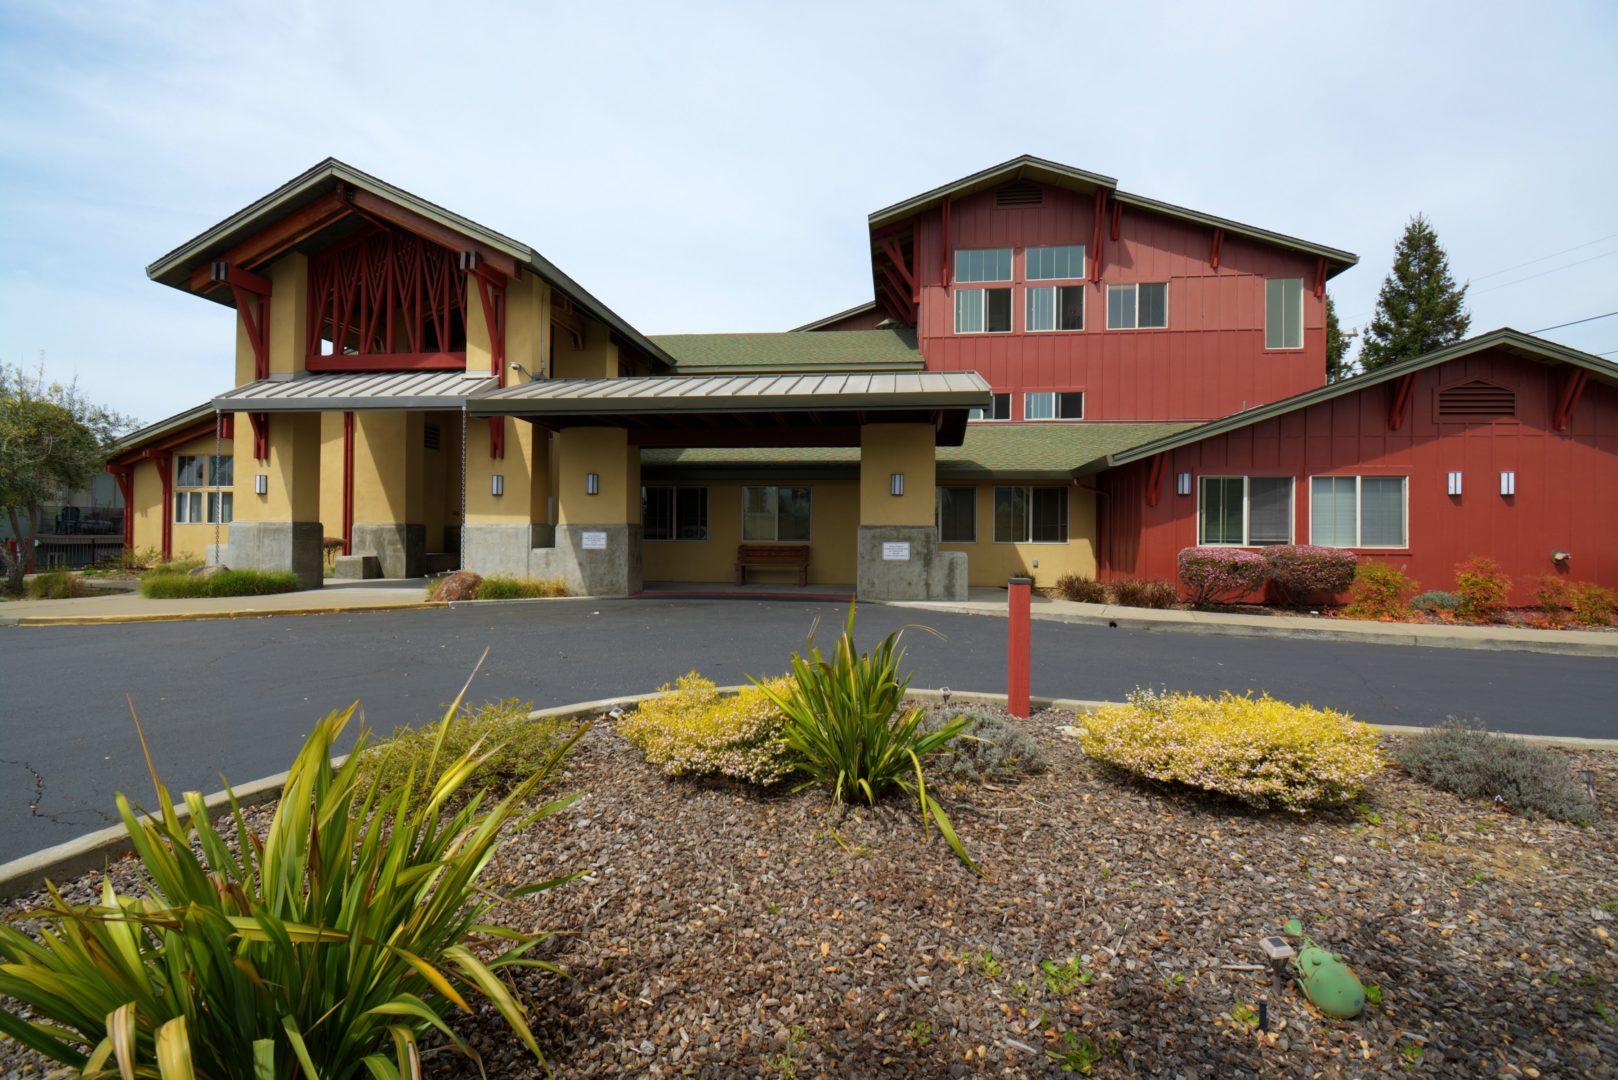 Image of Bancroft Senior Homes in Oakland, California